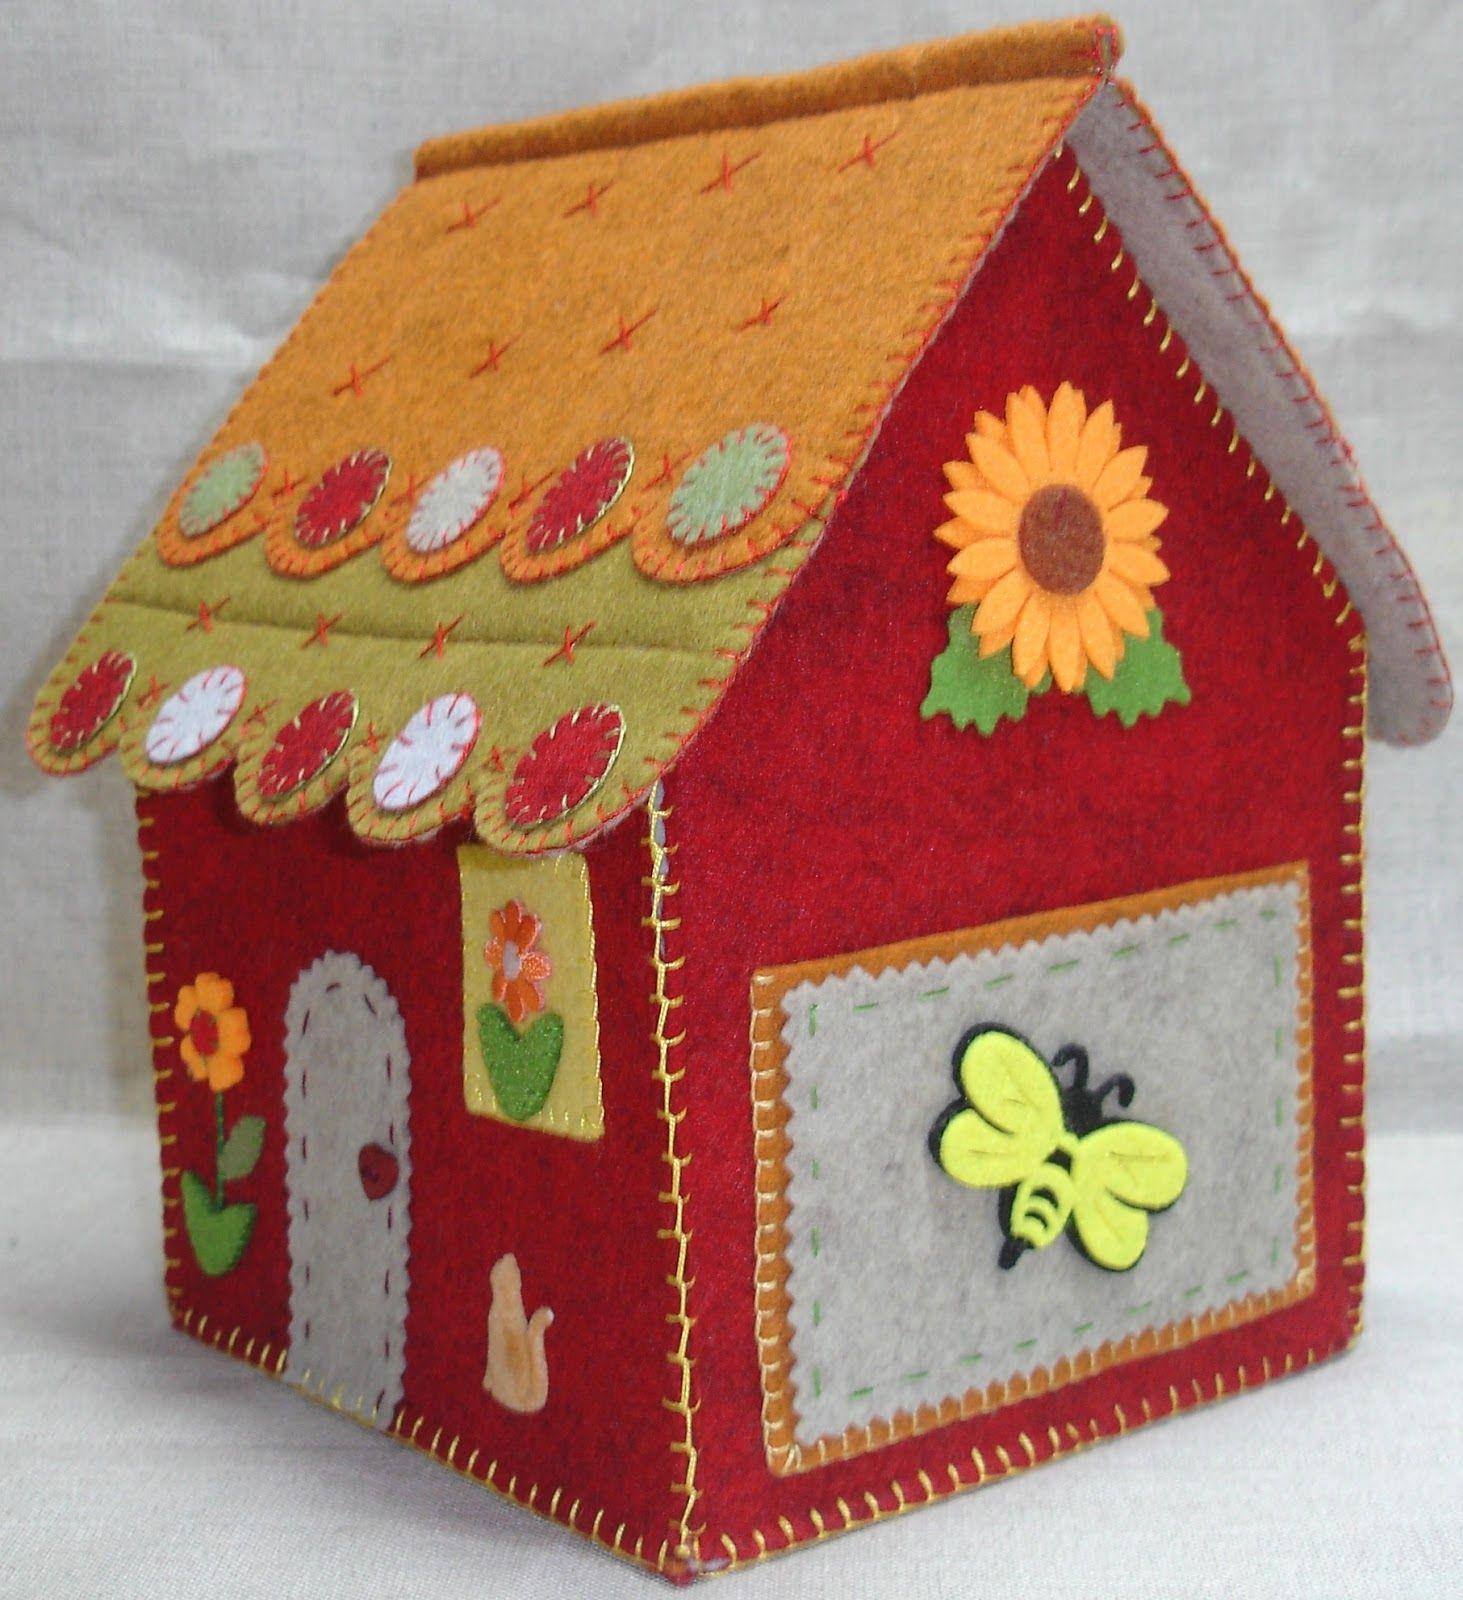 Laterales de casitas patchwork buscar con google - Casas de patchwork ...